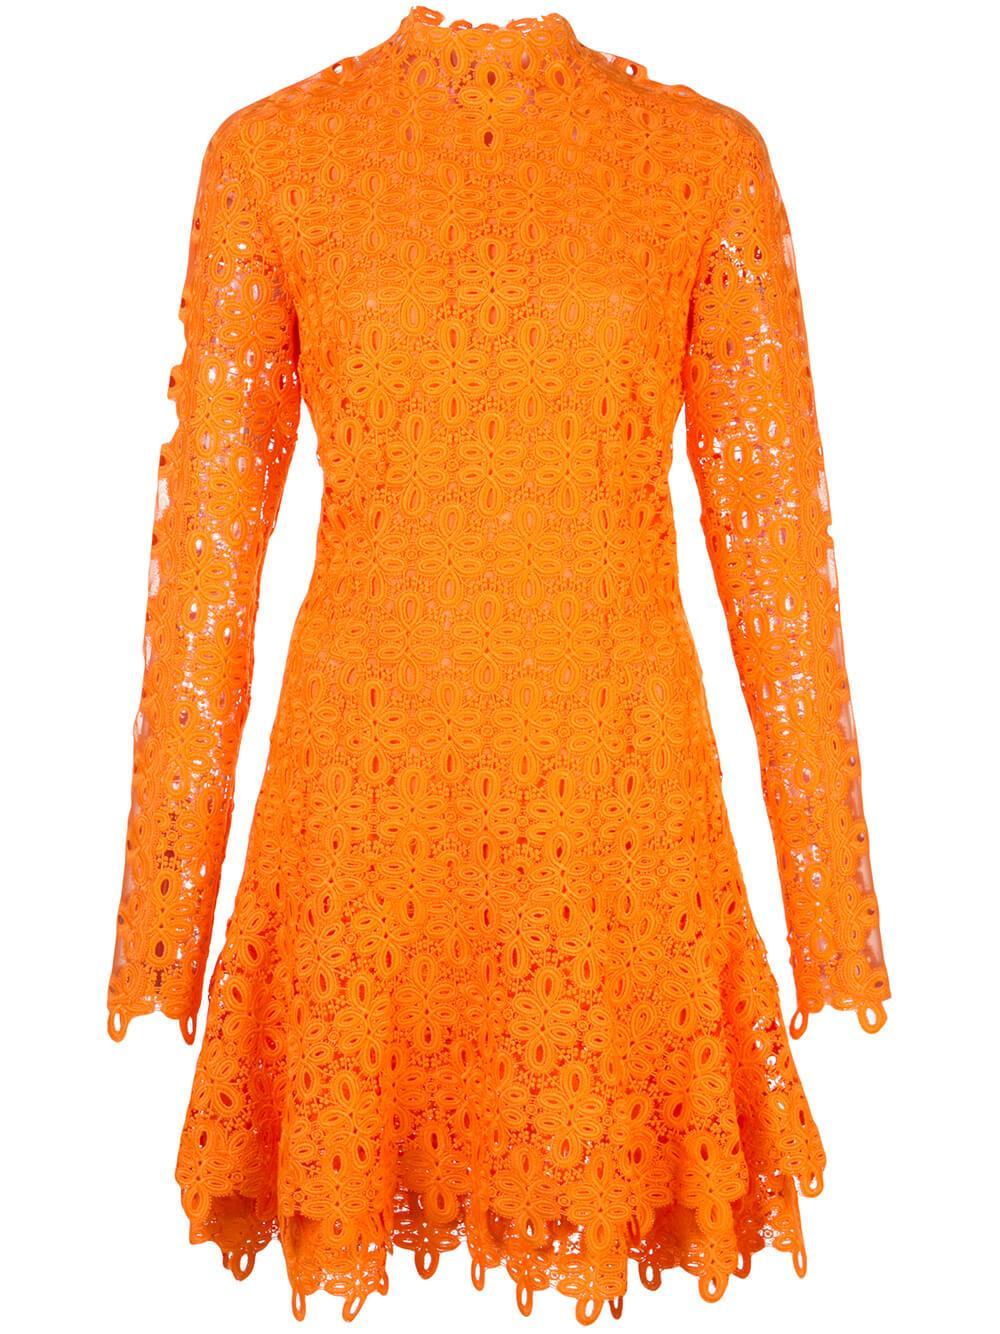 Long Sleeve Giupure Lace Mini Dress